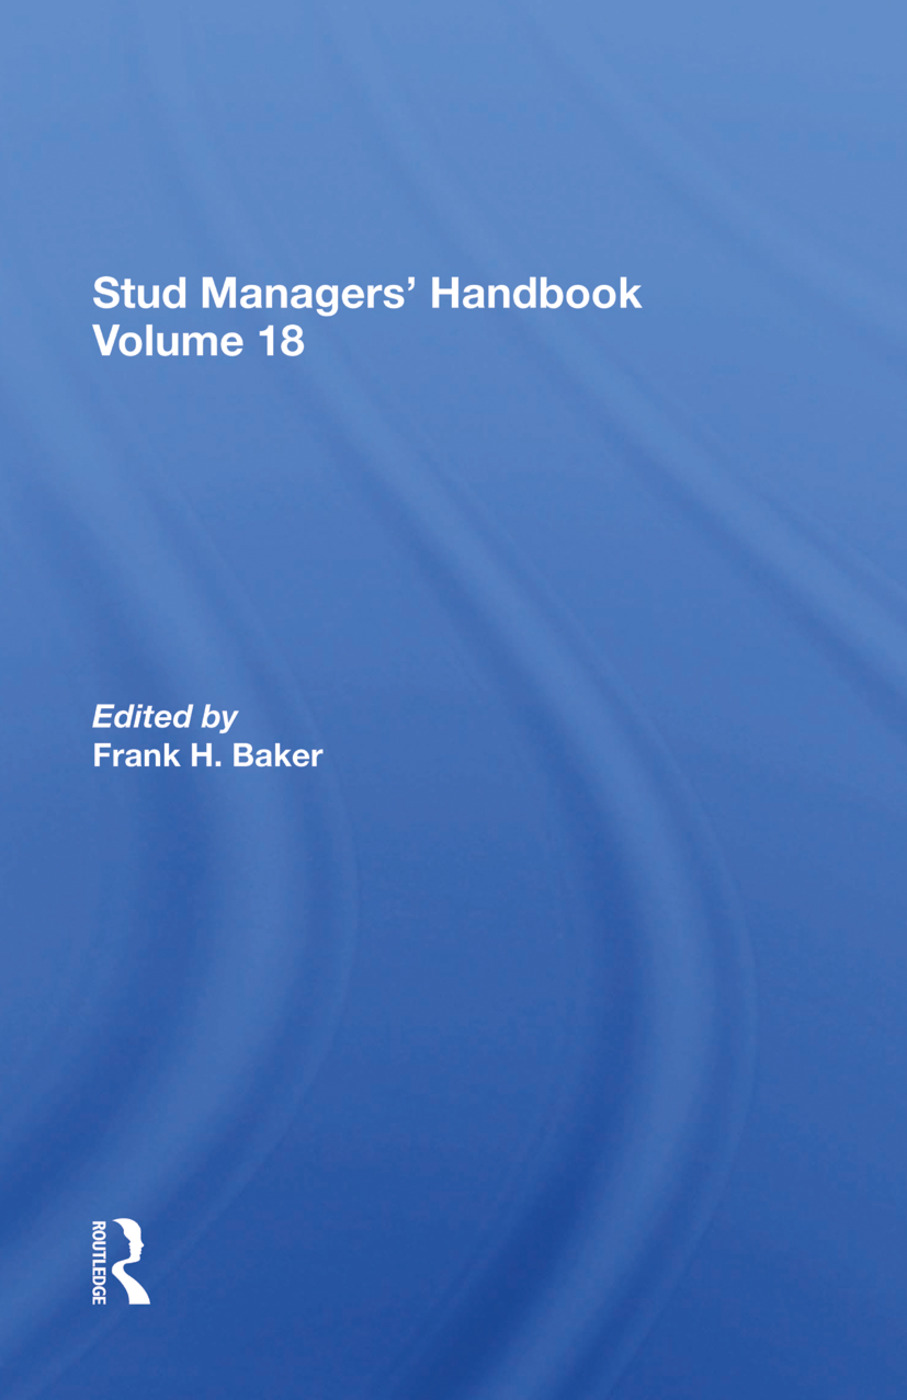 Stud Managers' Handbook, Vol. 18: 1st Edition (Hardback) book cover